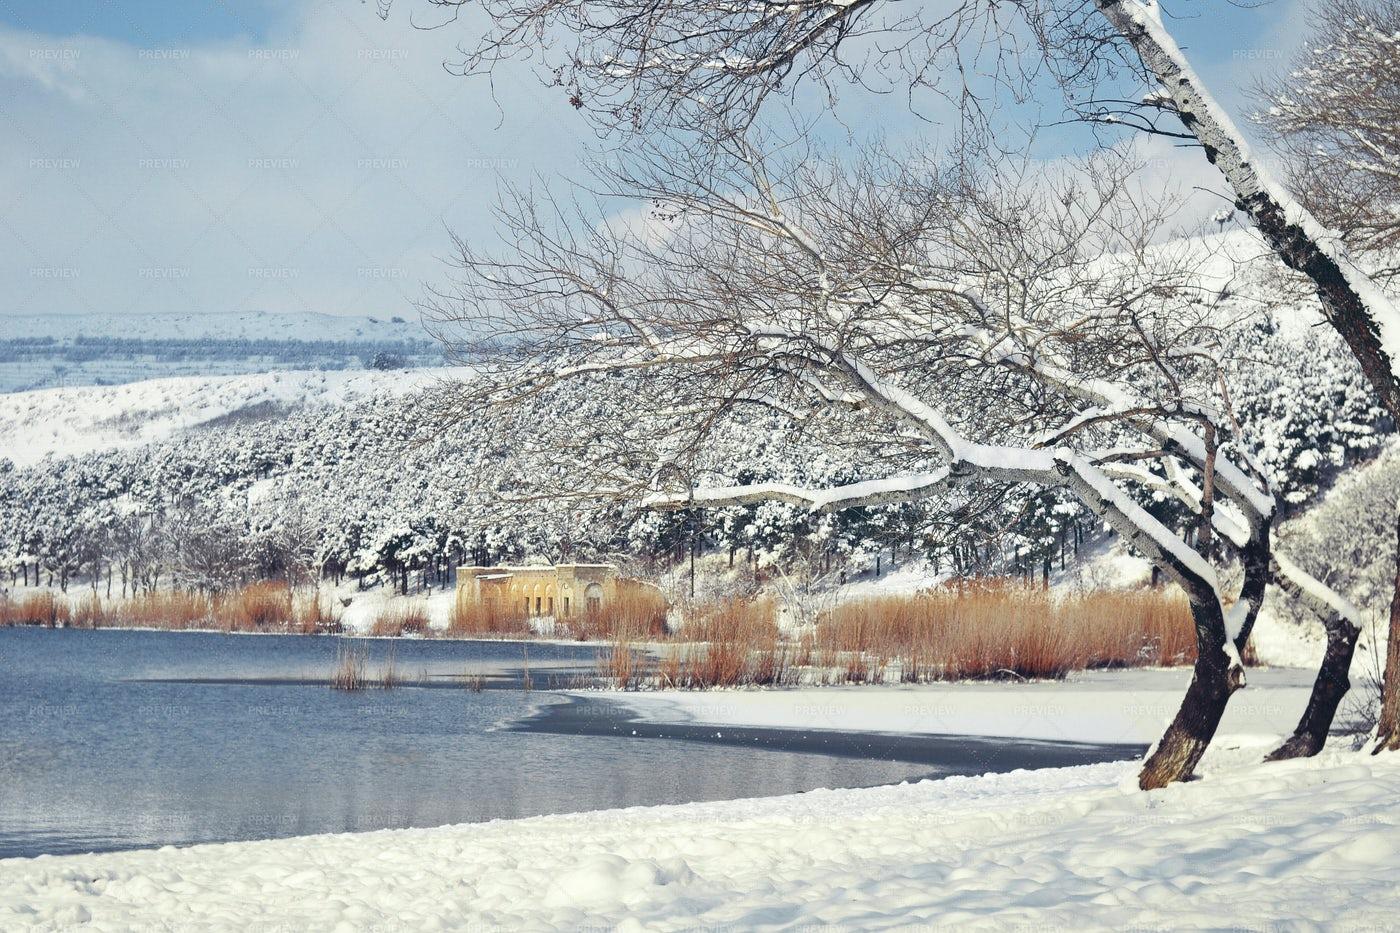 Snowy Trees Beside A Lake: Stock Photos